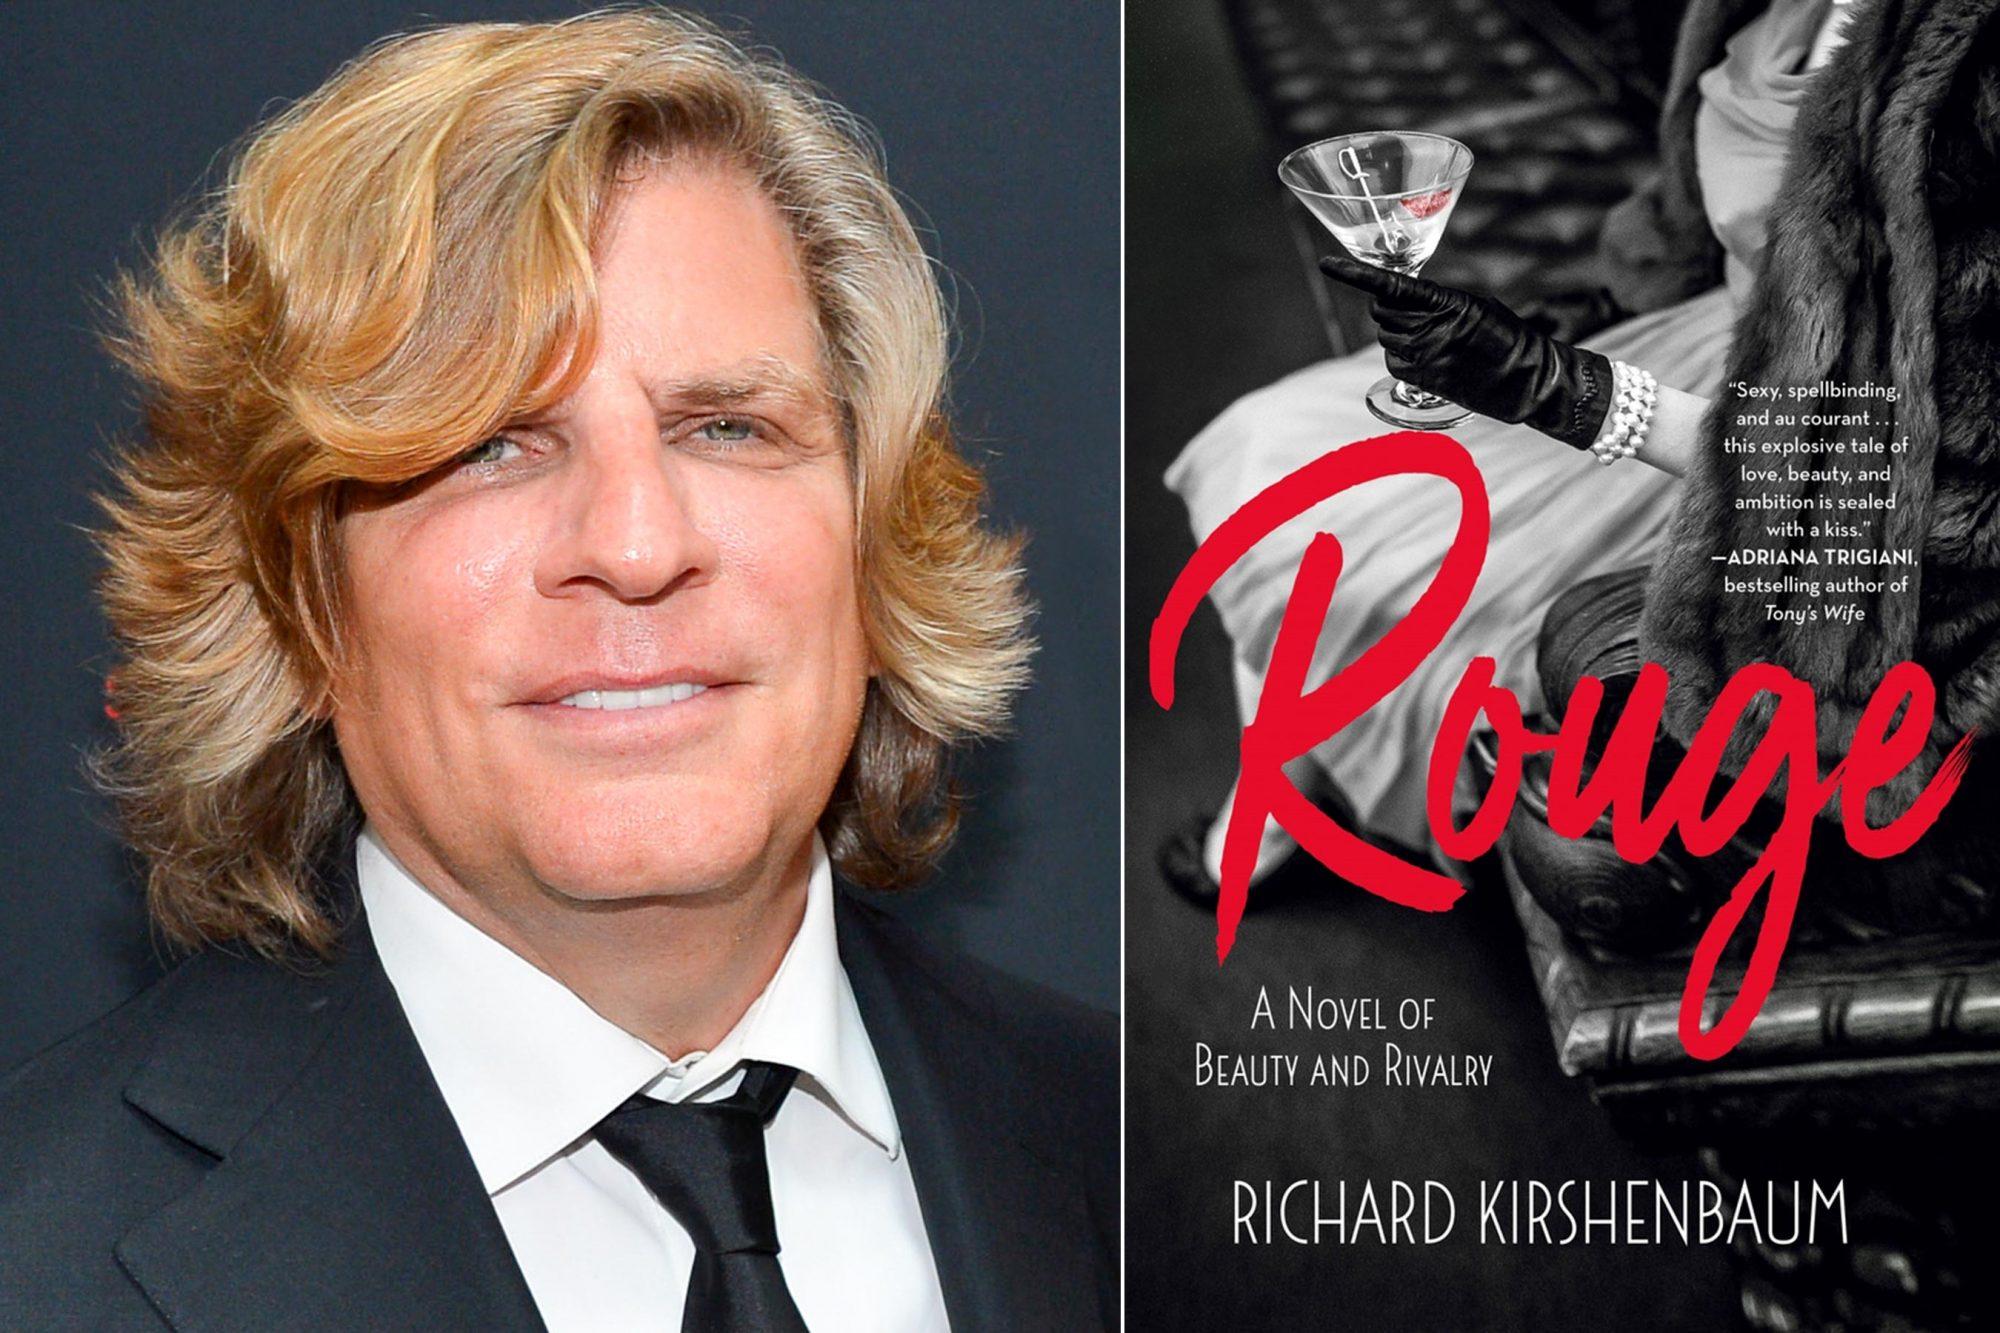 NEW YORK, NY - JUNE 05: Richard Kirshenbaum attends Richard Kirshenbaum's Book Party, ROUGE! at Pace Gallery on June 5, 2019 in New York City. (Photo by Patrick McMullan/Patrick McMullan via Getty Images) Rouge by Richard Kirshenbaum CR: St. Martin's Press